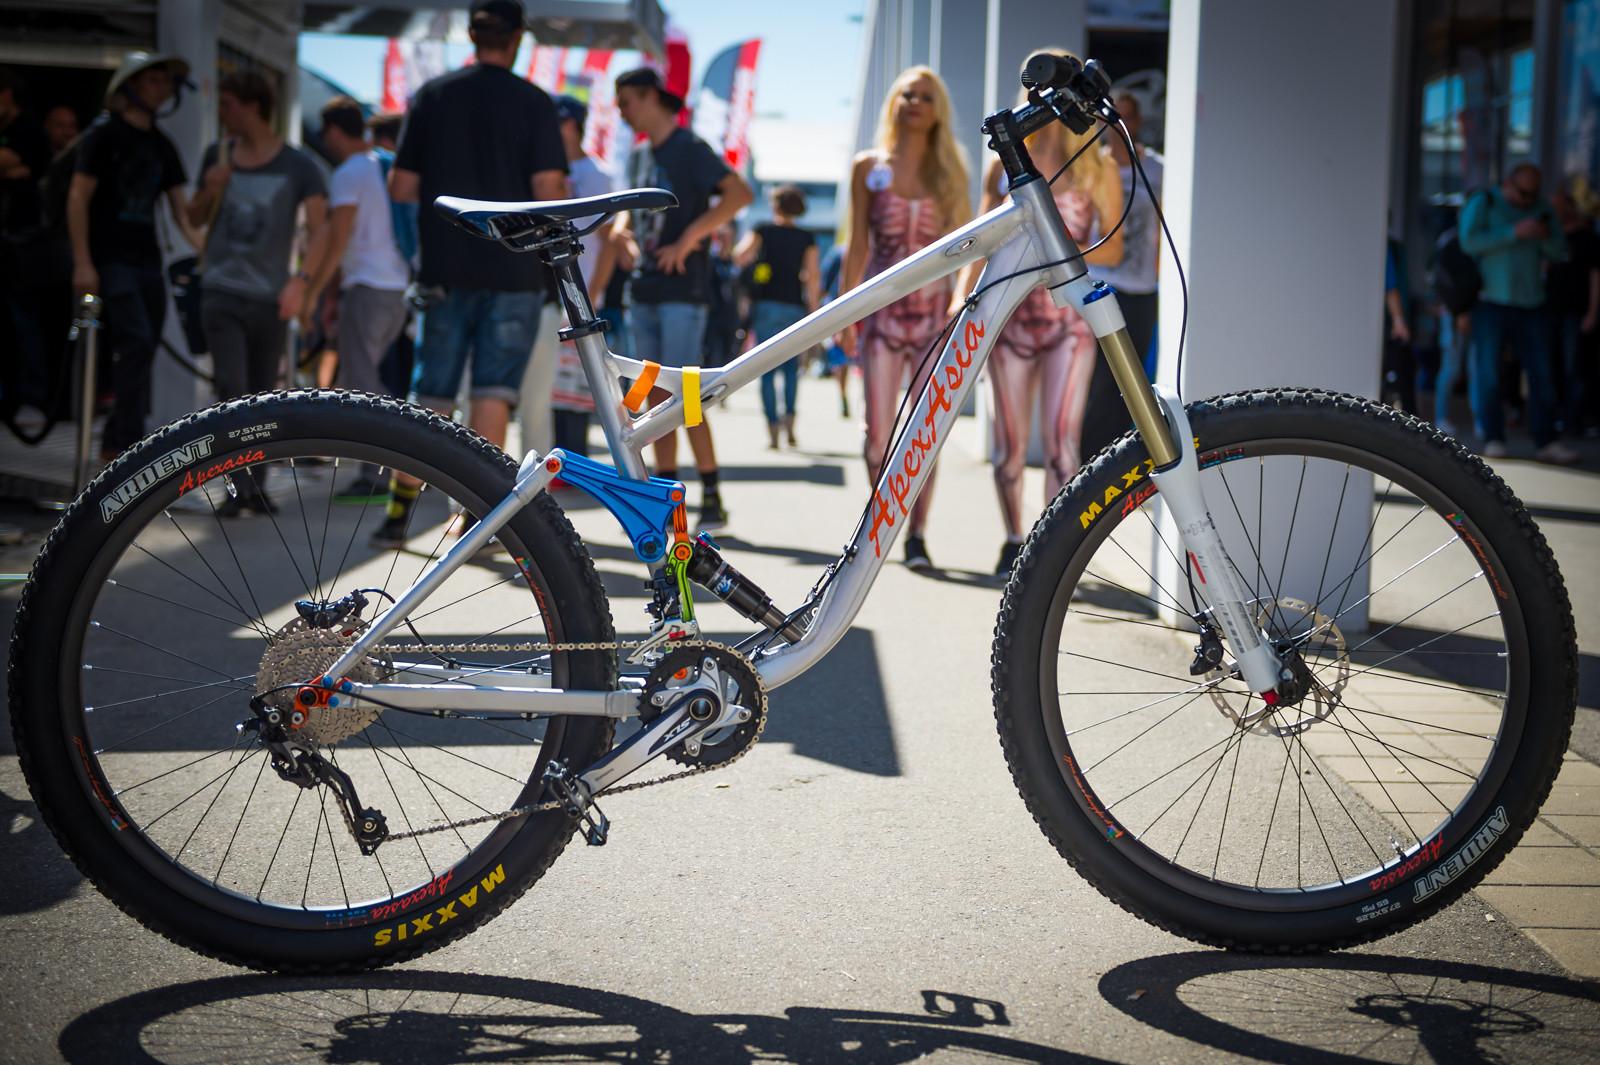 Apex Asia Project Bike - bturman - Mountain Biking Pictures - Vital MTB